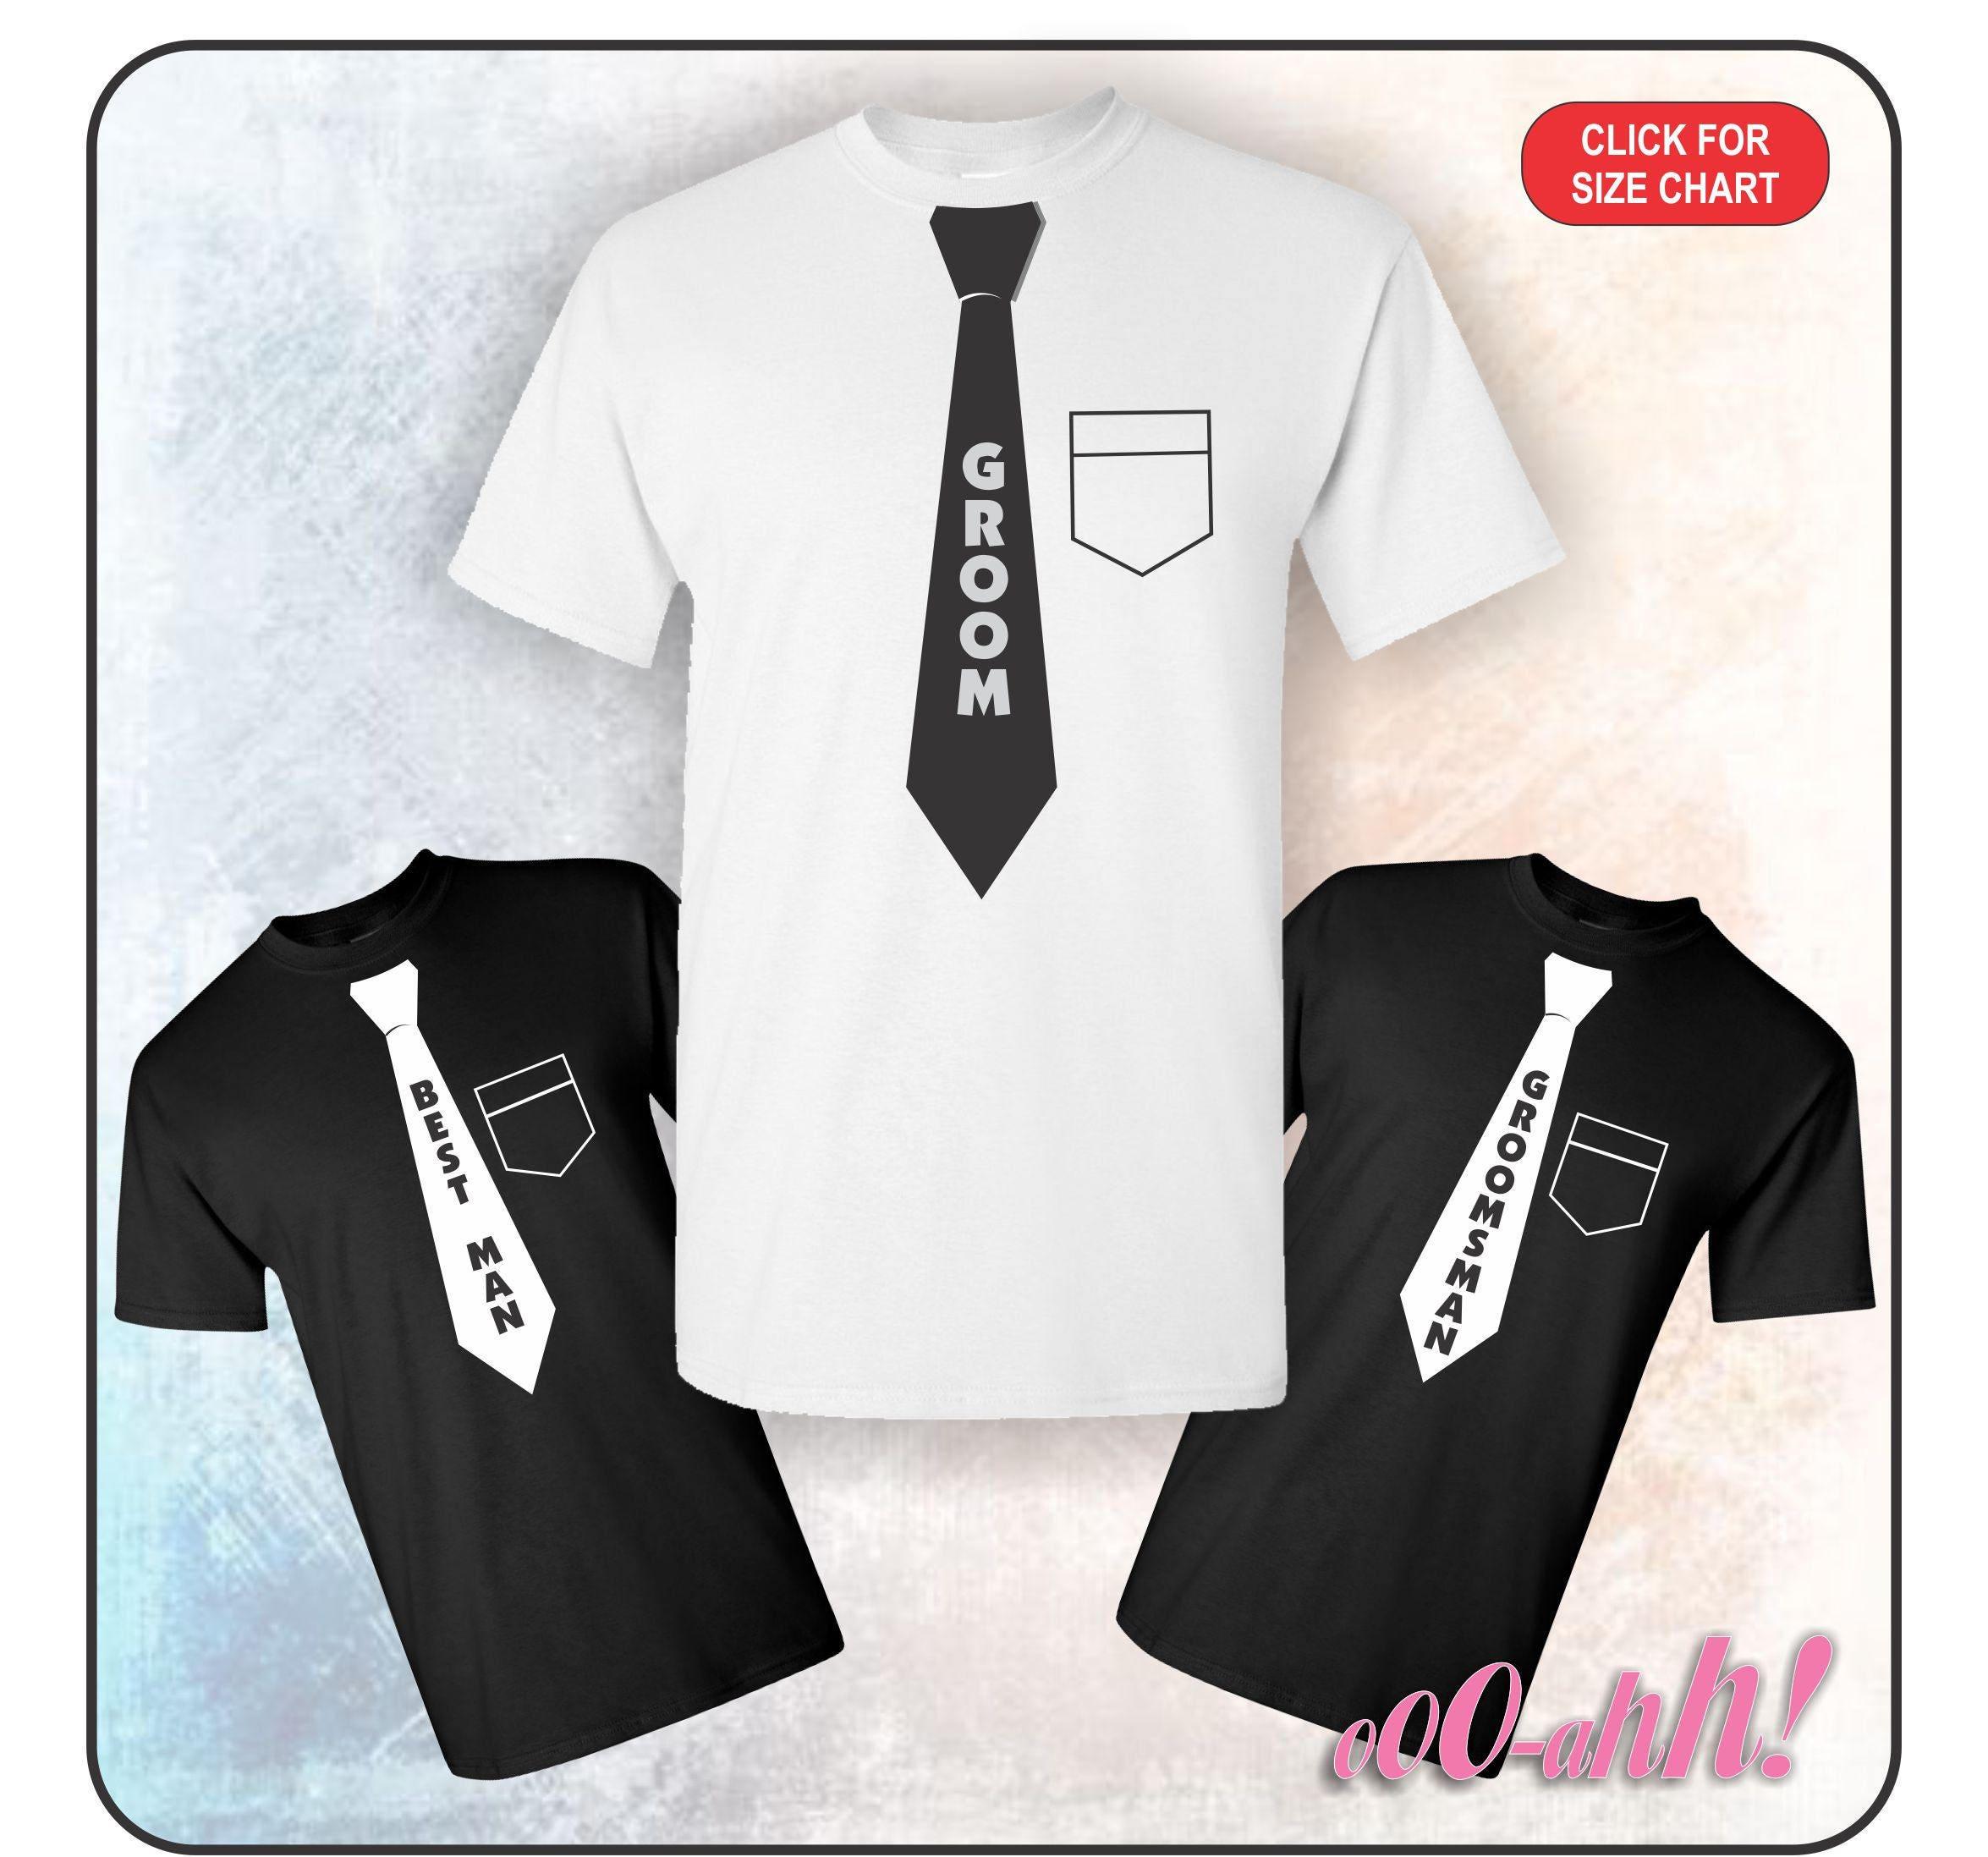 53dd1f7b Bachelor Party Shirts Groom Best Man Groomsmen custom | Etsy